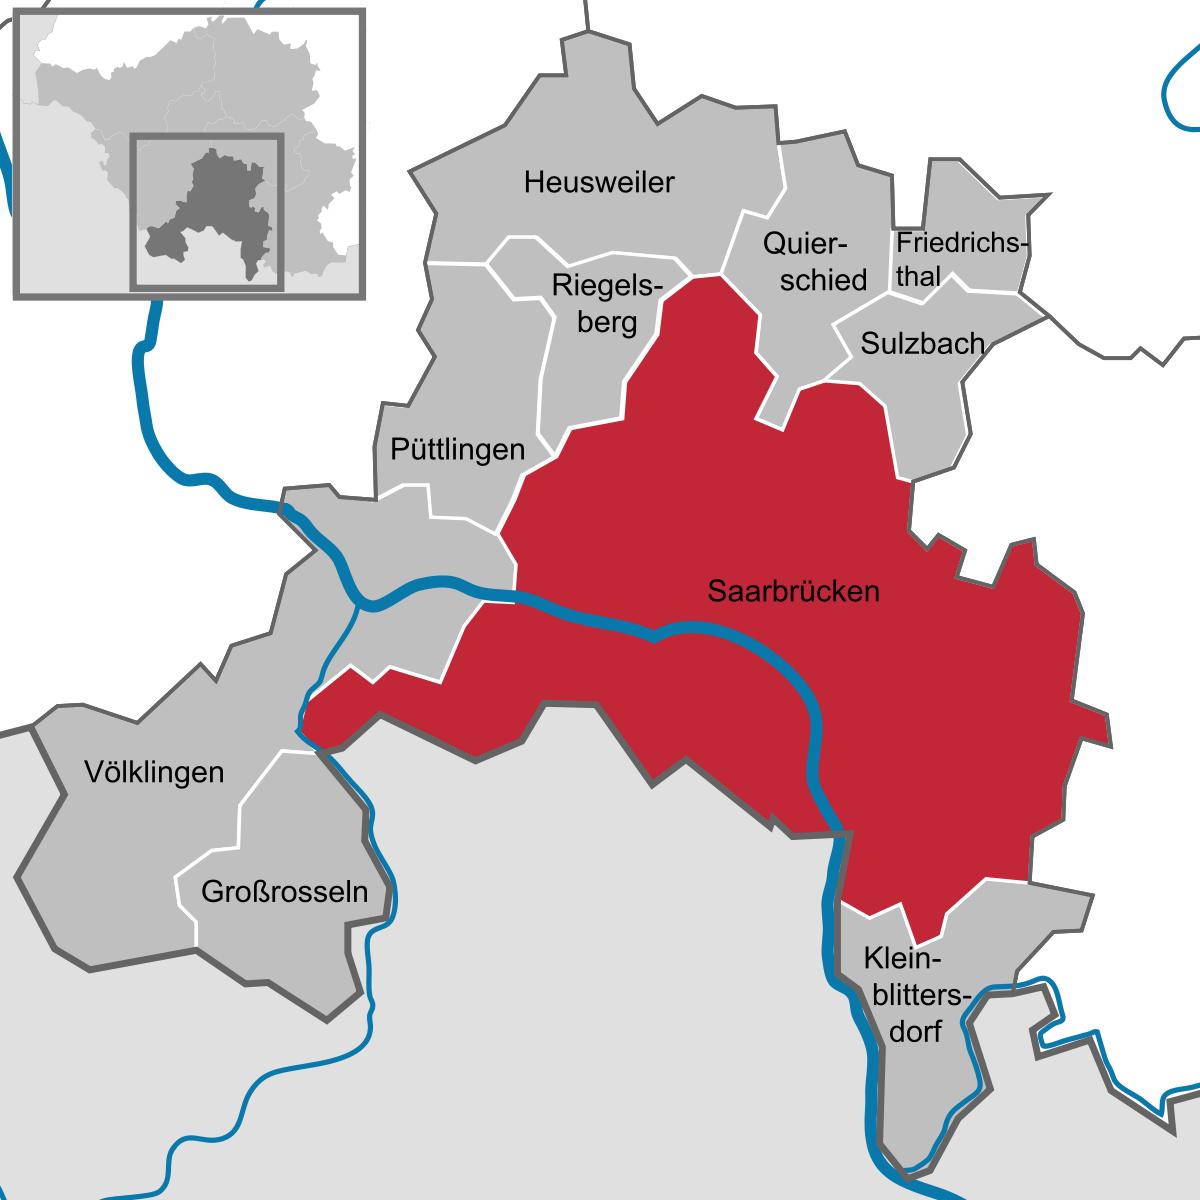 Saarbrucken Backgrounds, Compatible - PC, Mobile, Gadgets  1200x1200 px